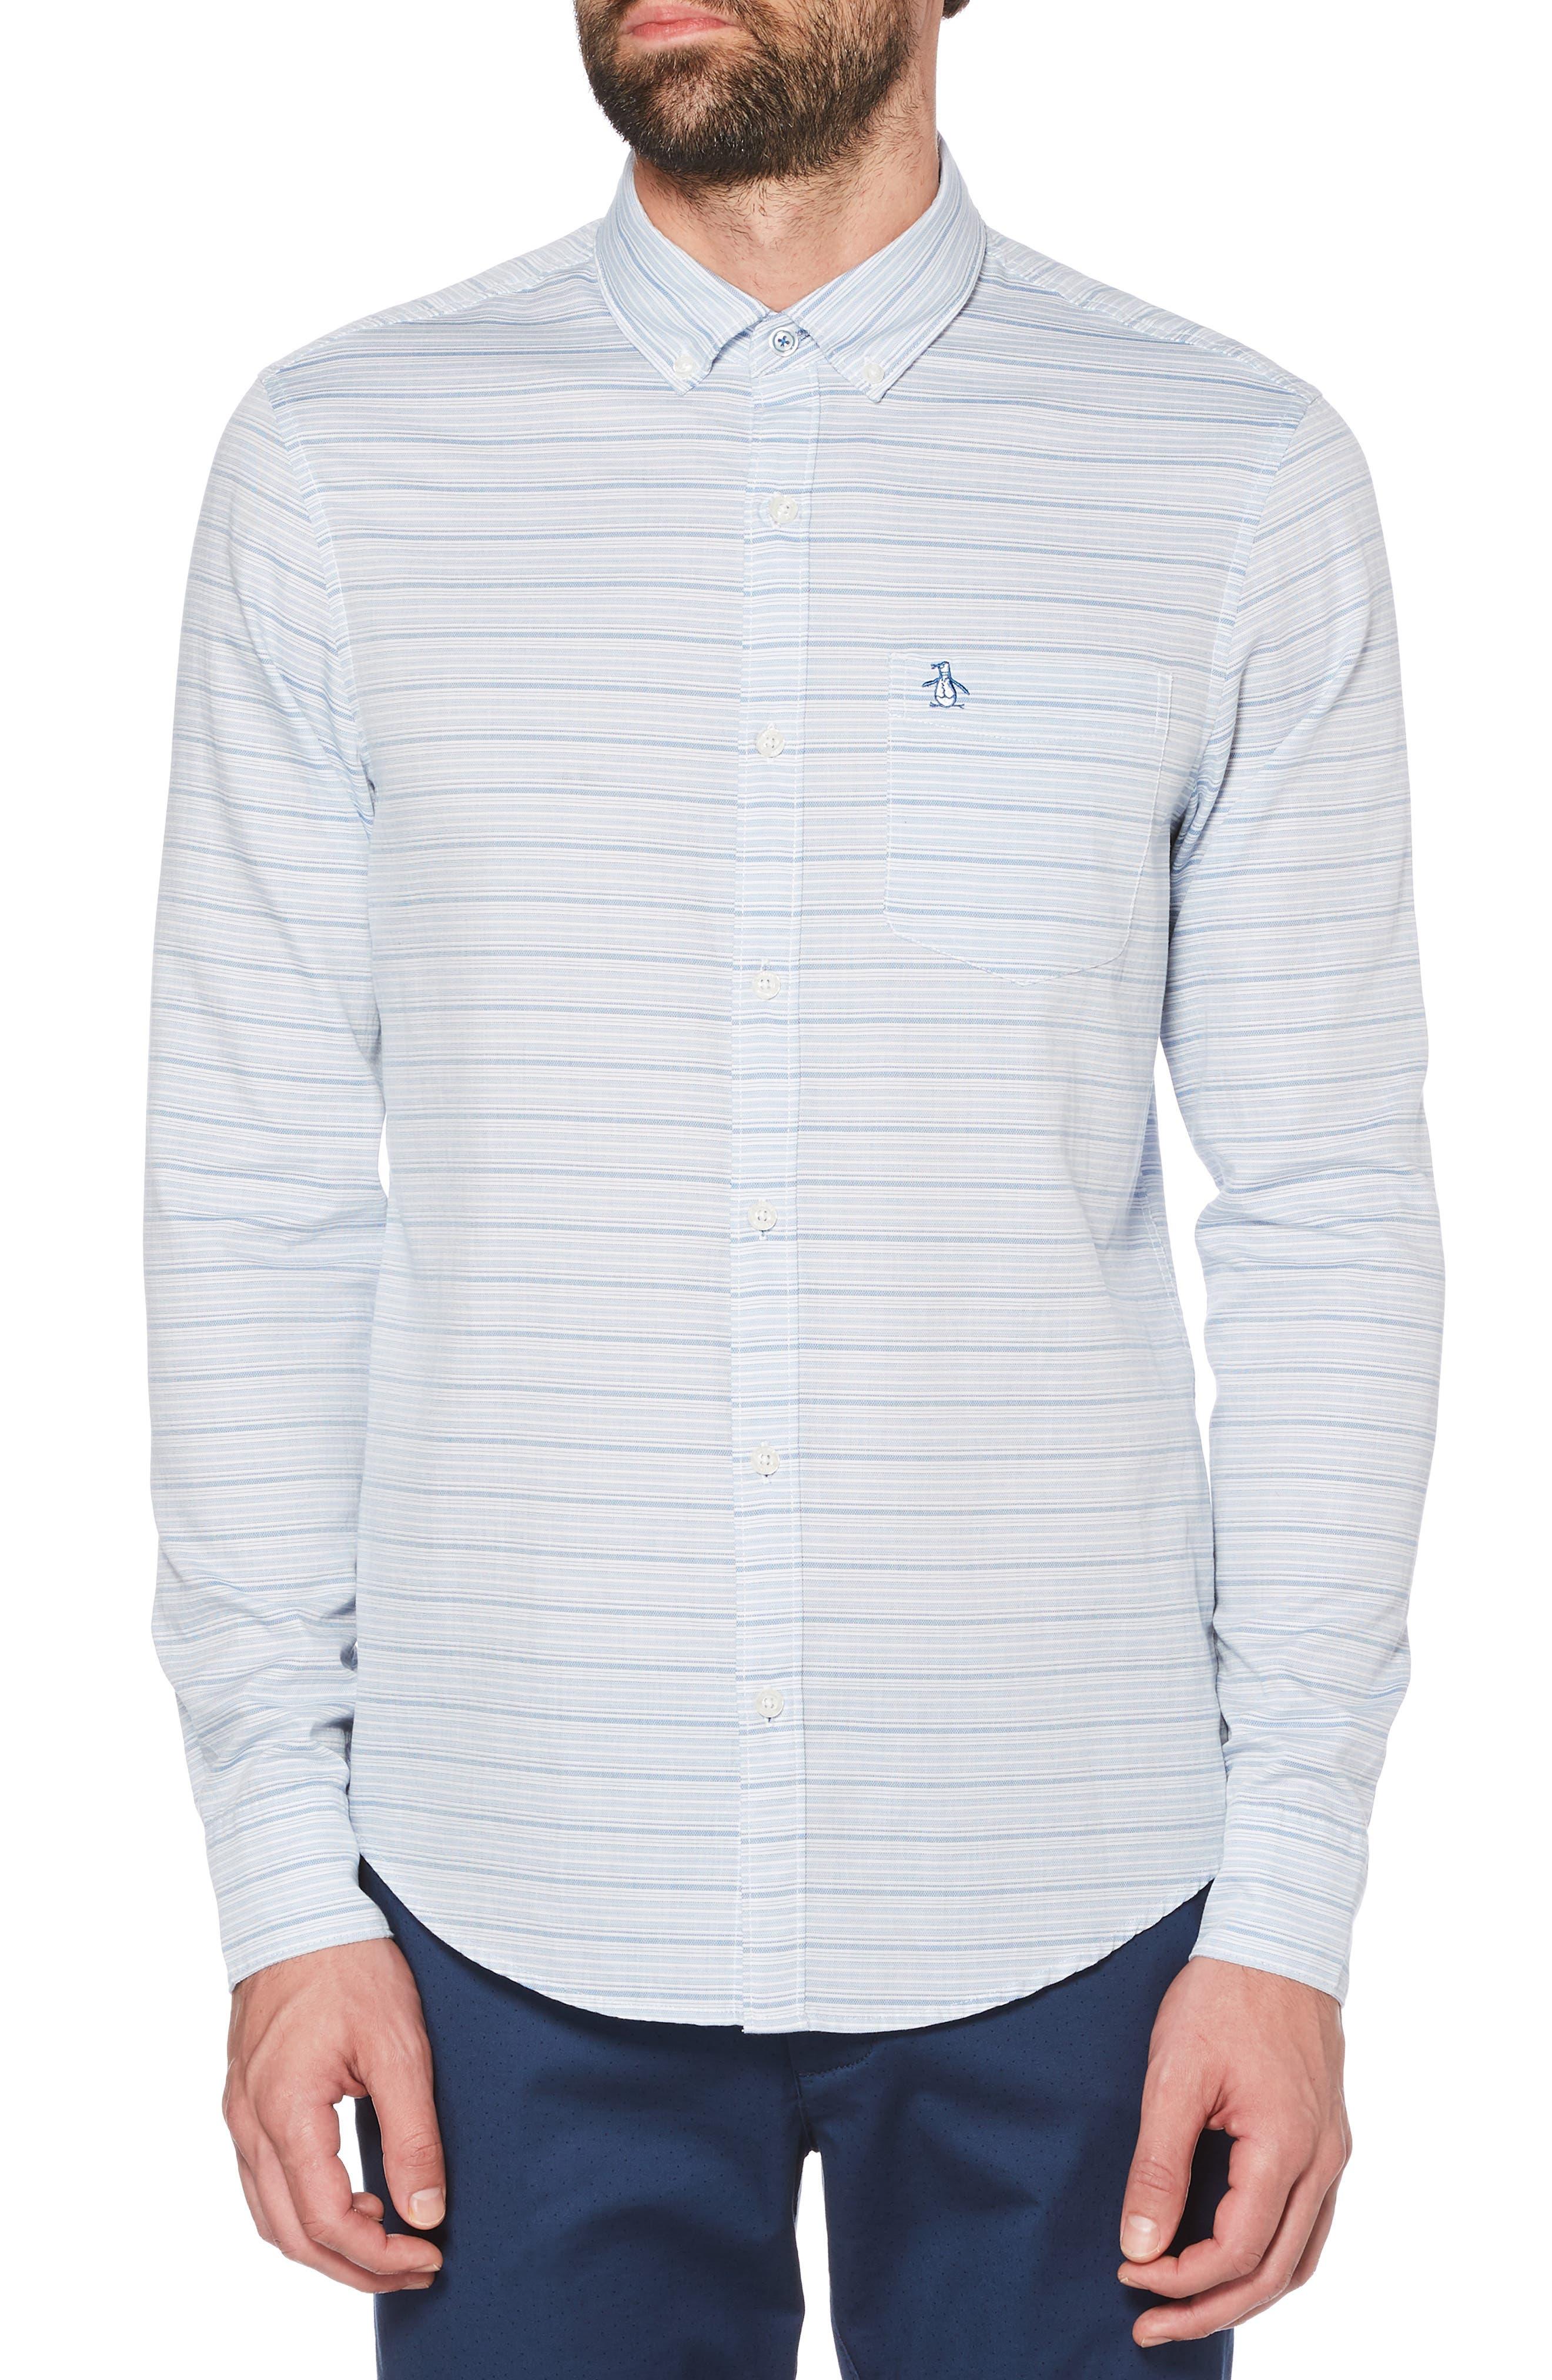 ORIGINAL PENGUIN, Slim Fit Dobby Sport Shirt, Main thumbnail 1, color, BRIGHT WHITE